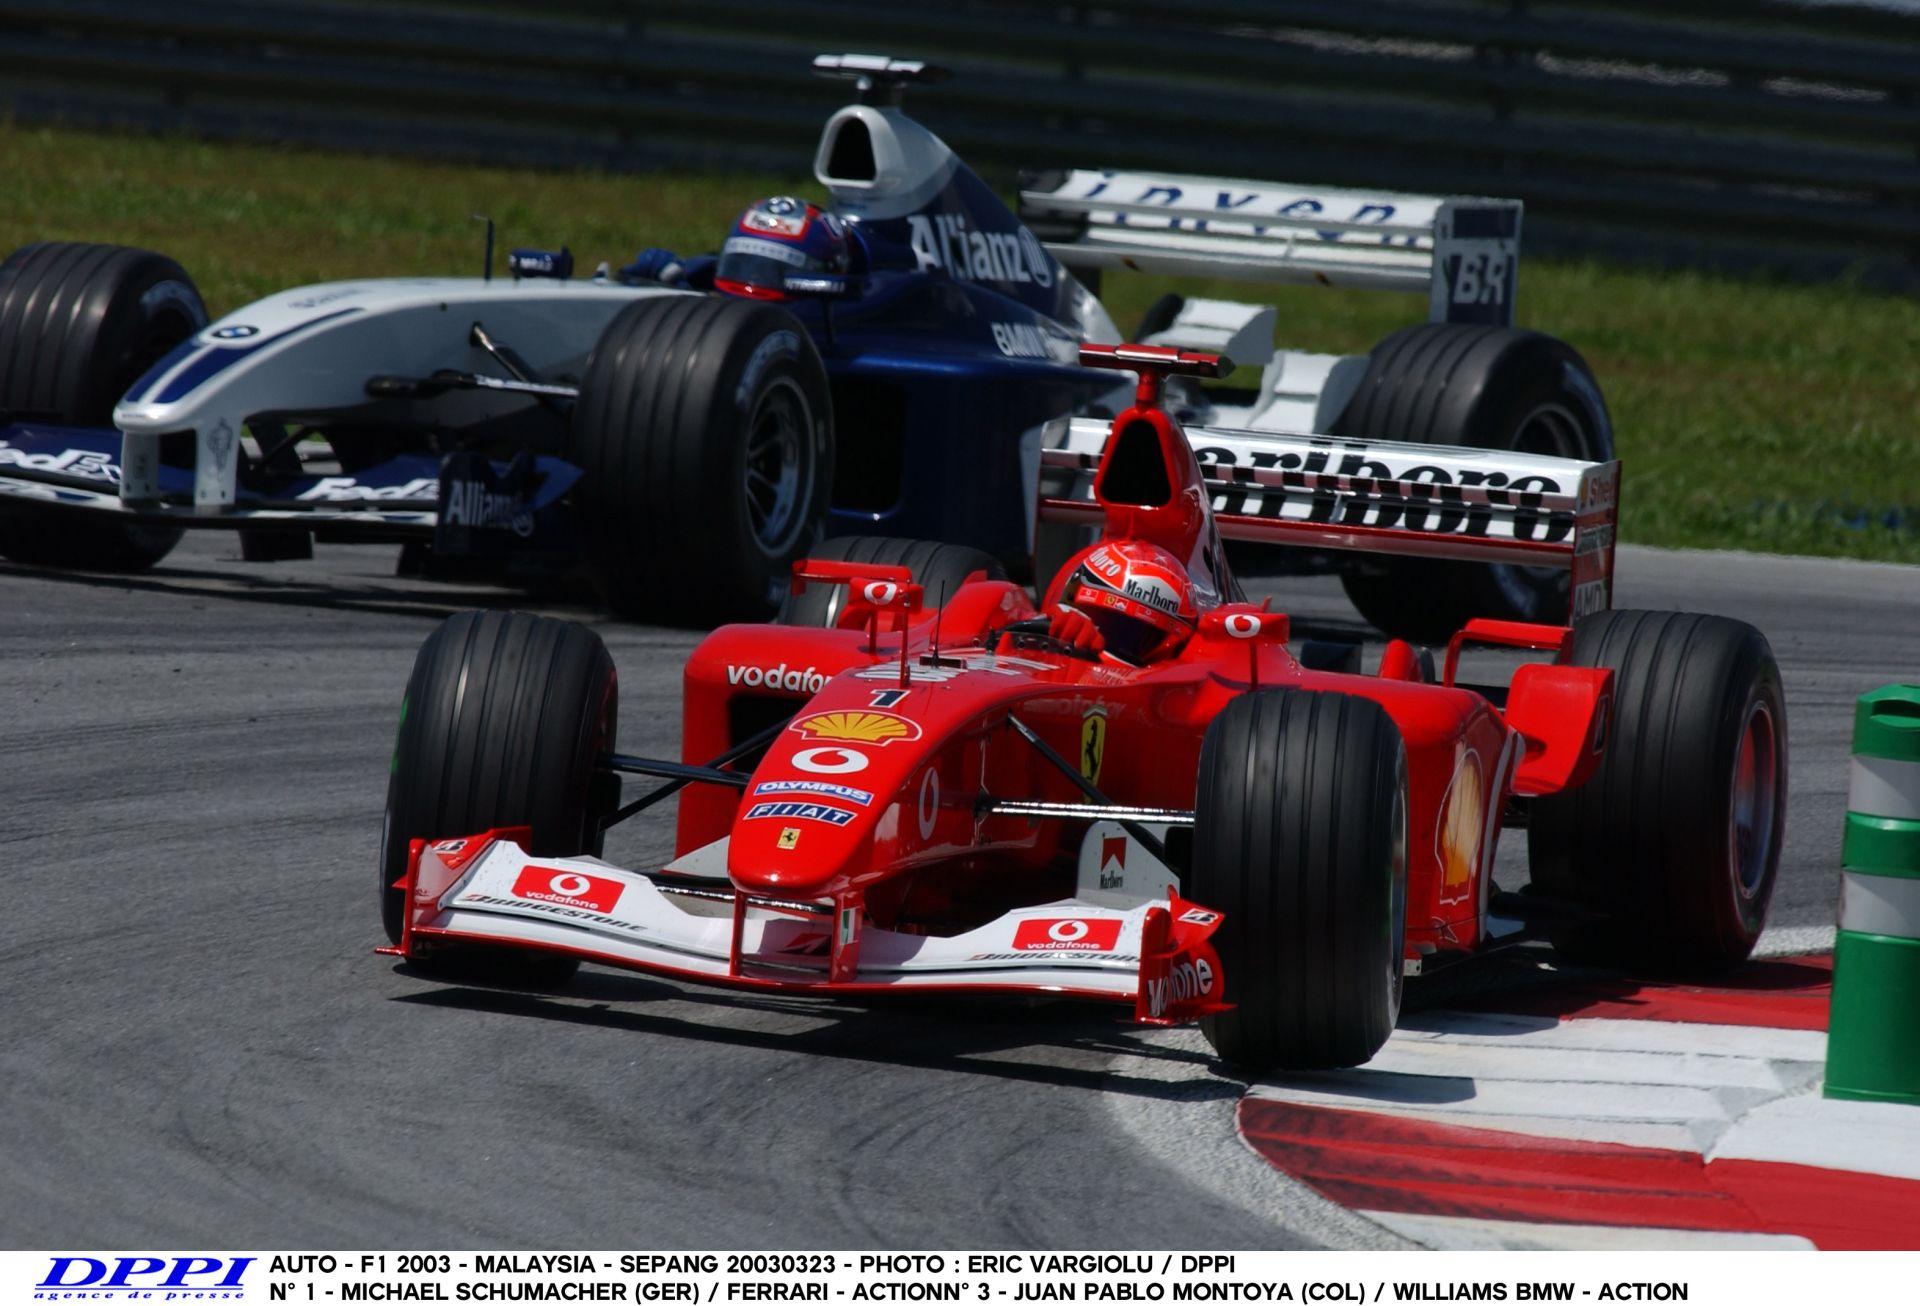 Schumacher ütközik, aztán beindul: F1 2003